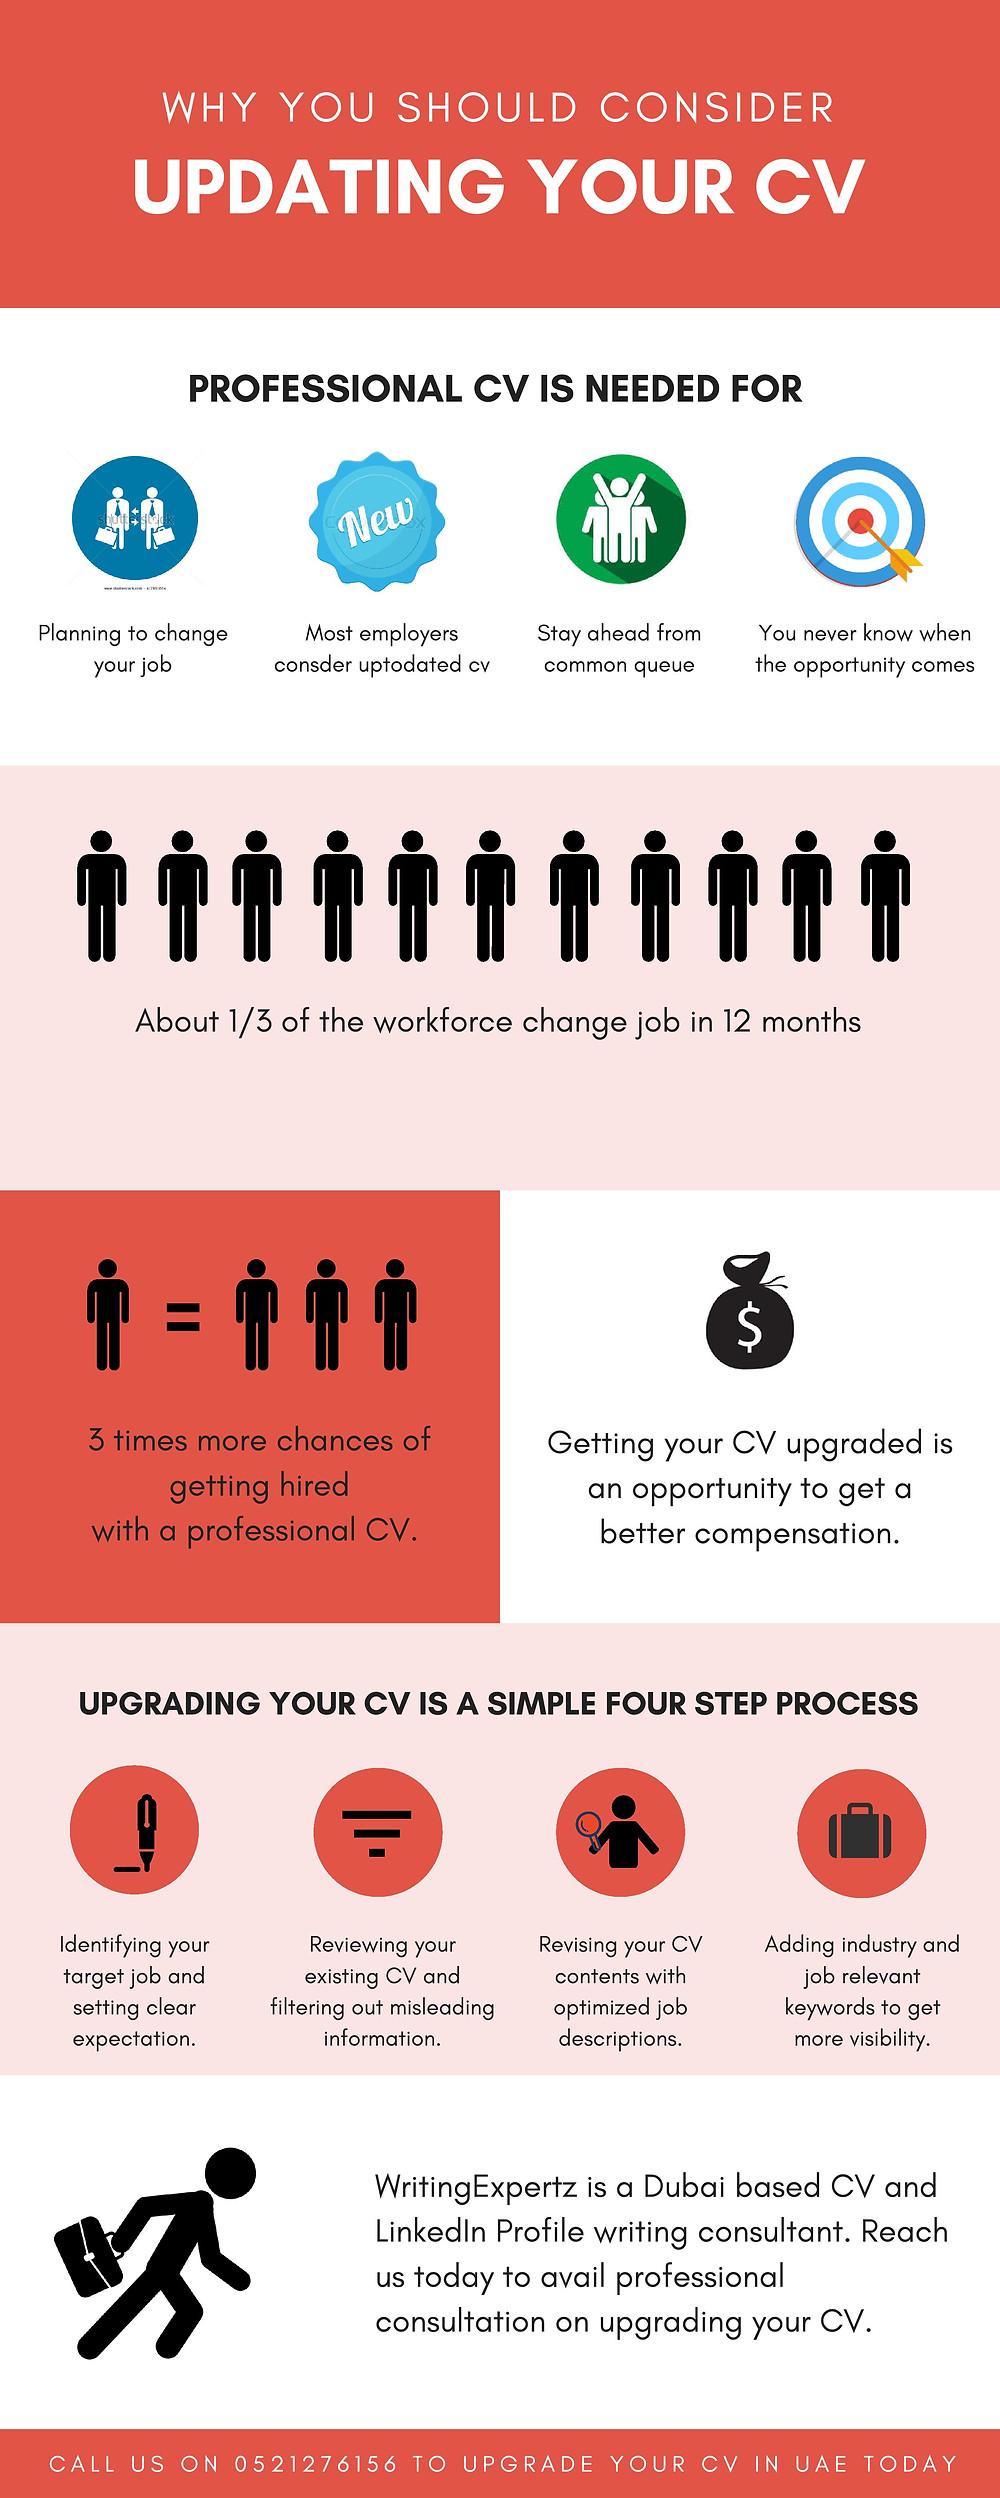 Why to upgrade your CV in Dubai Sharjah Abu Dhabi UAE